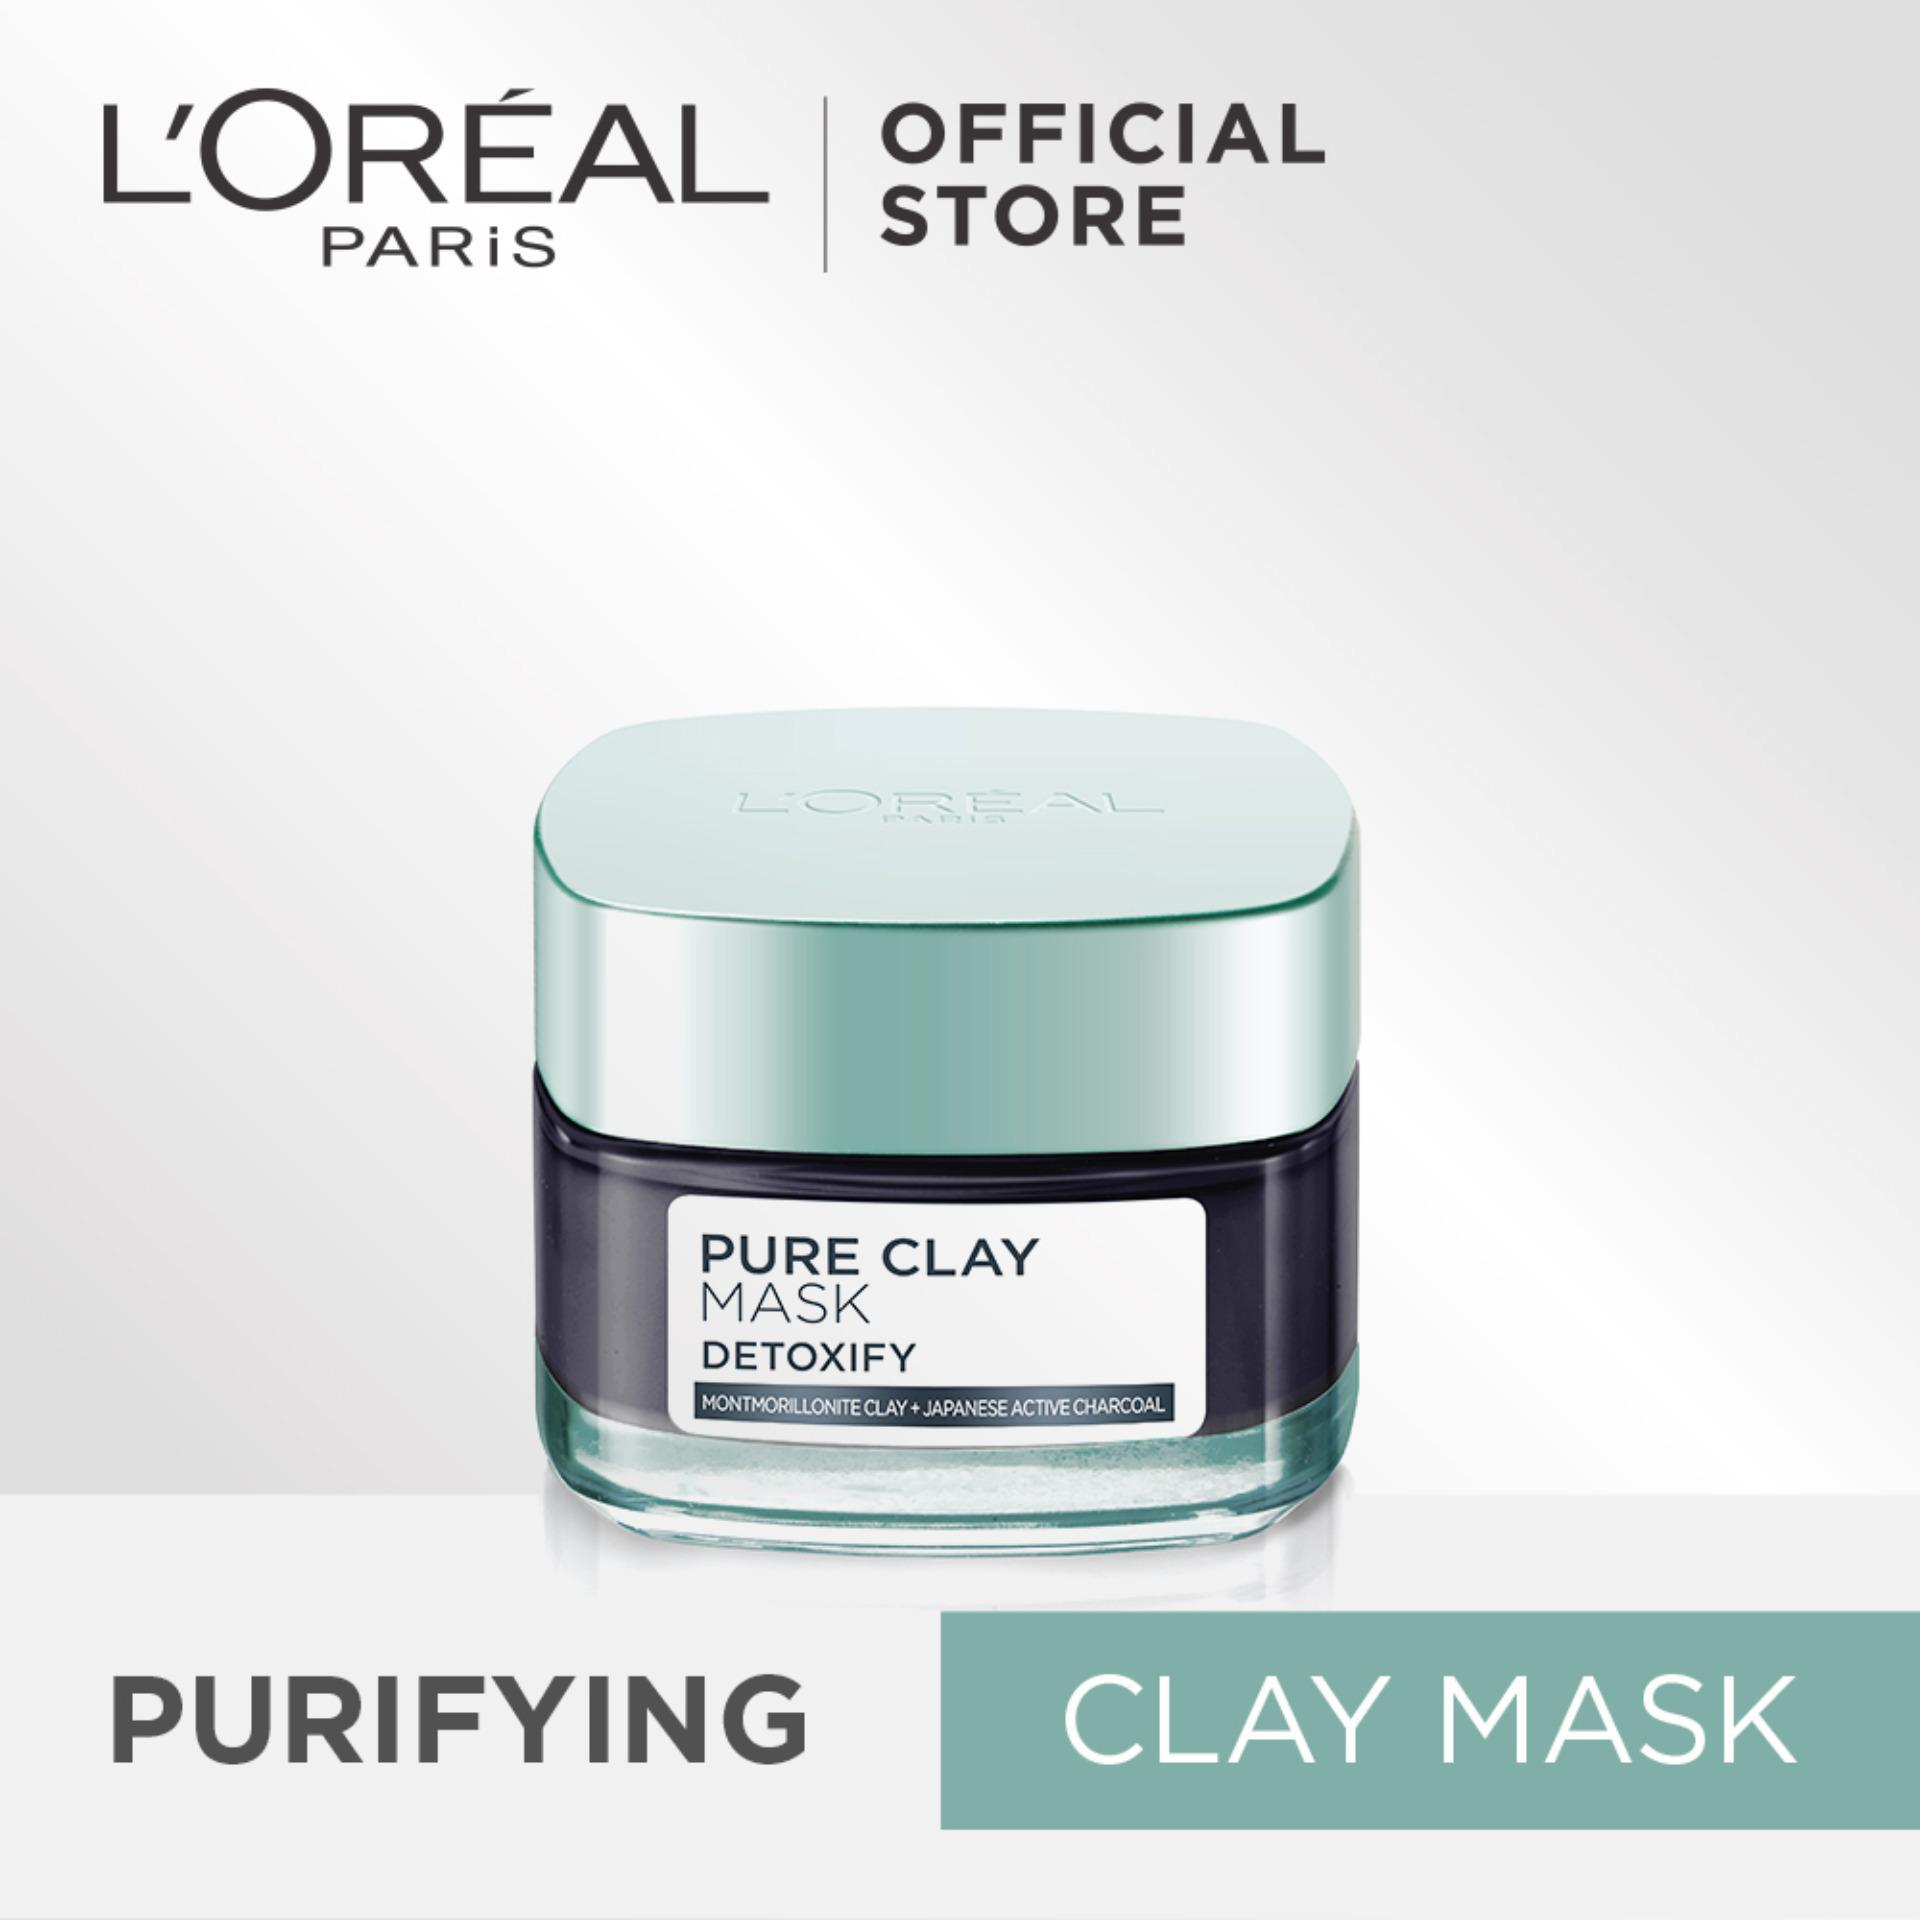 L Oreal Paris Detoxify Pure Clay Mask 50Ml Best Price